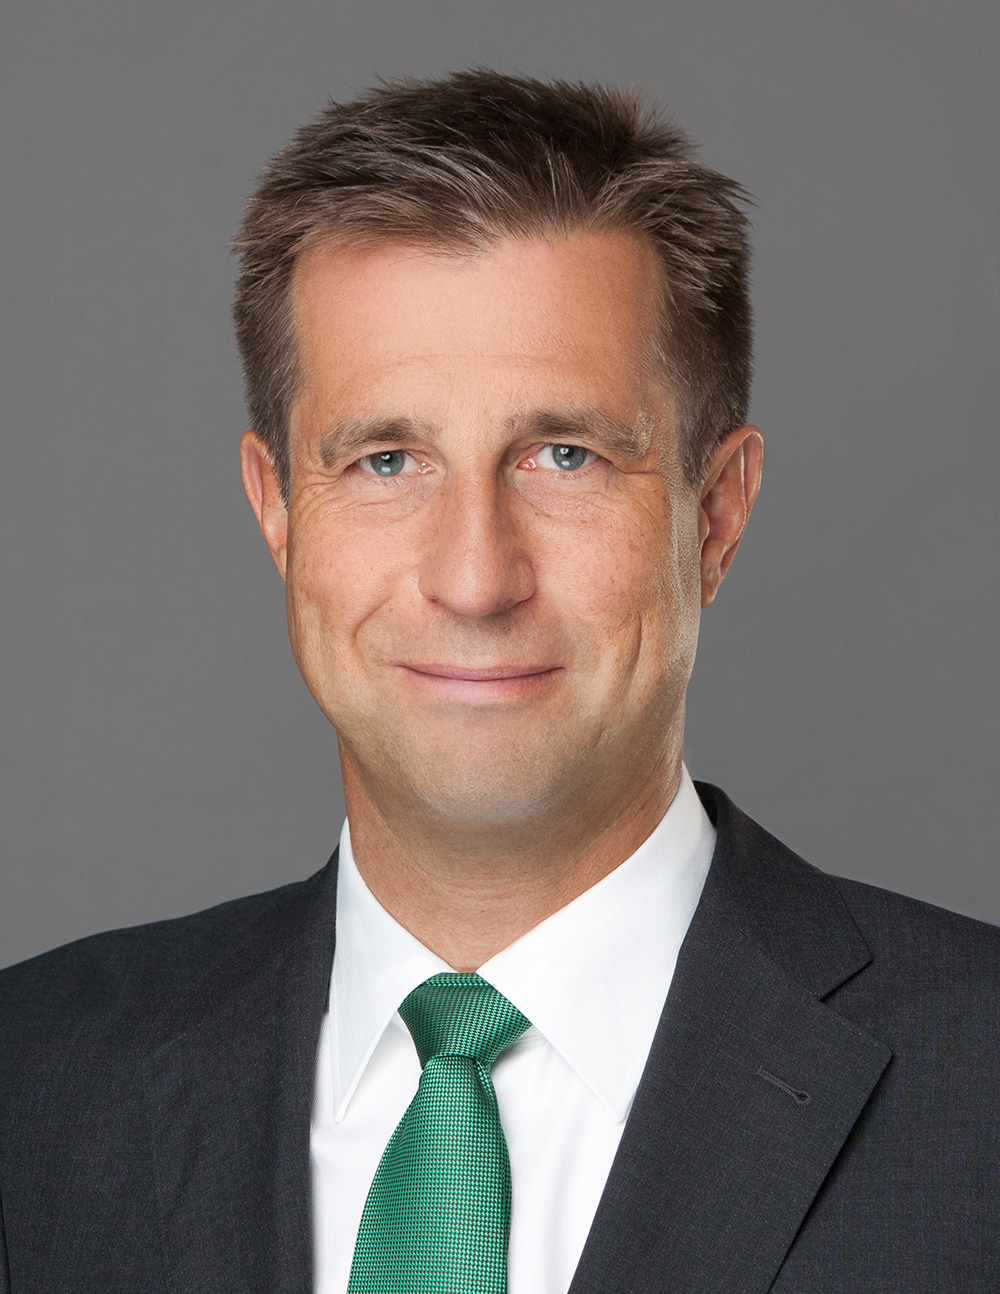 Michael Kotzbauer